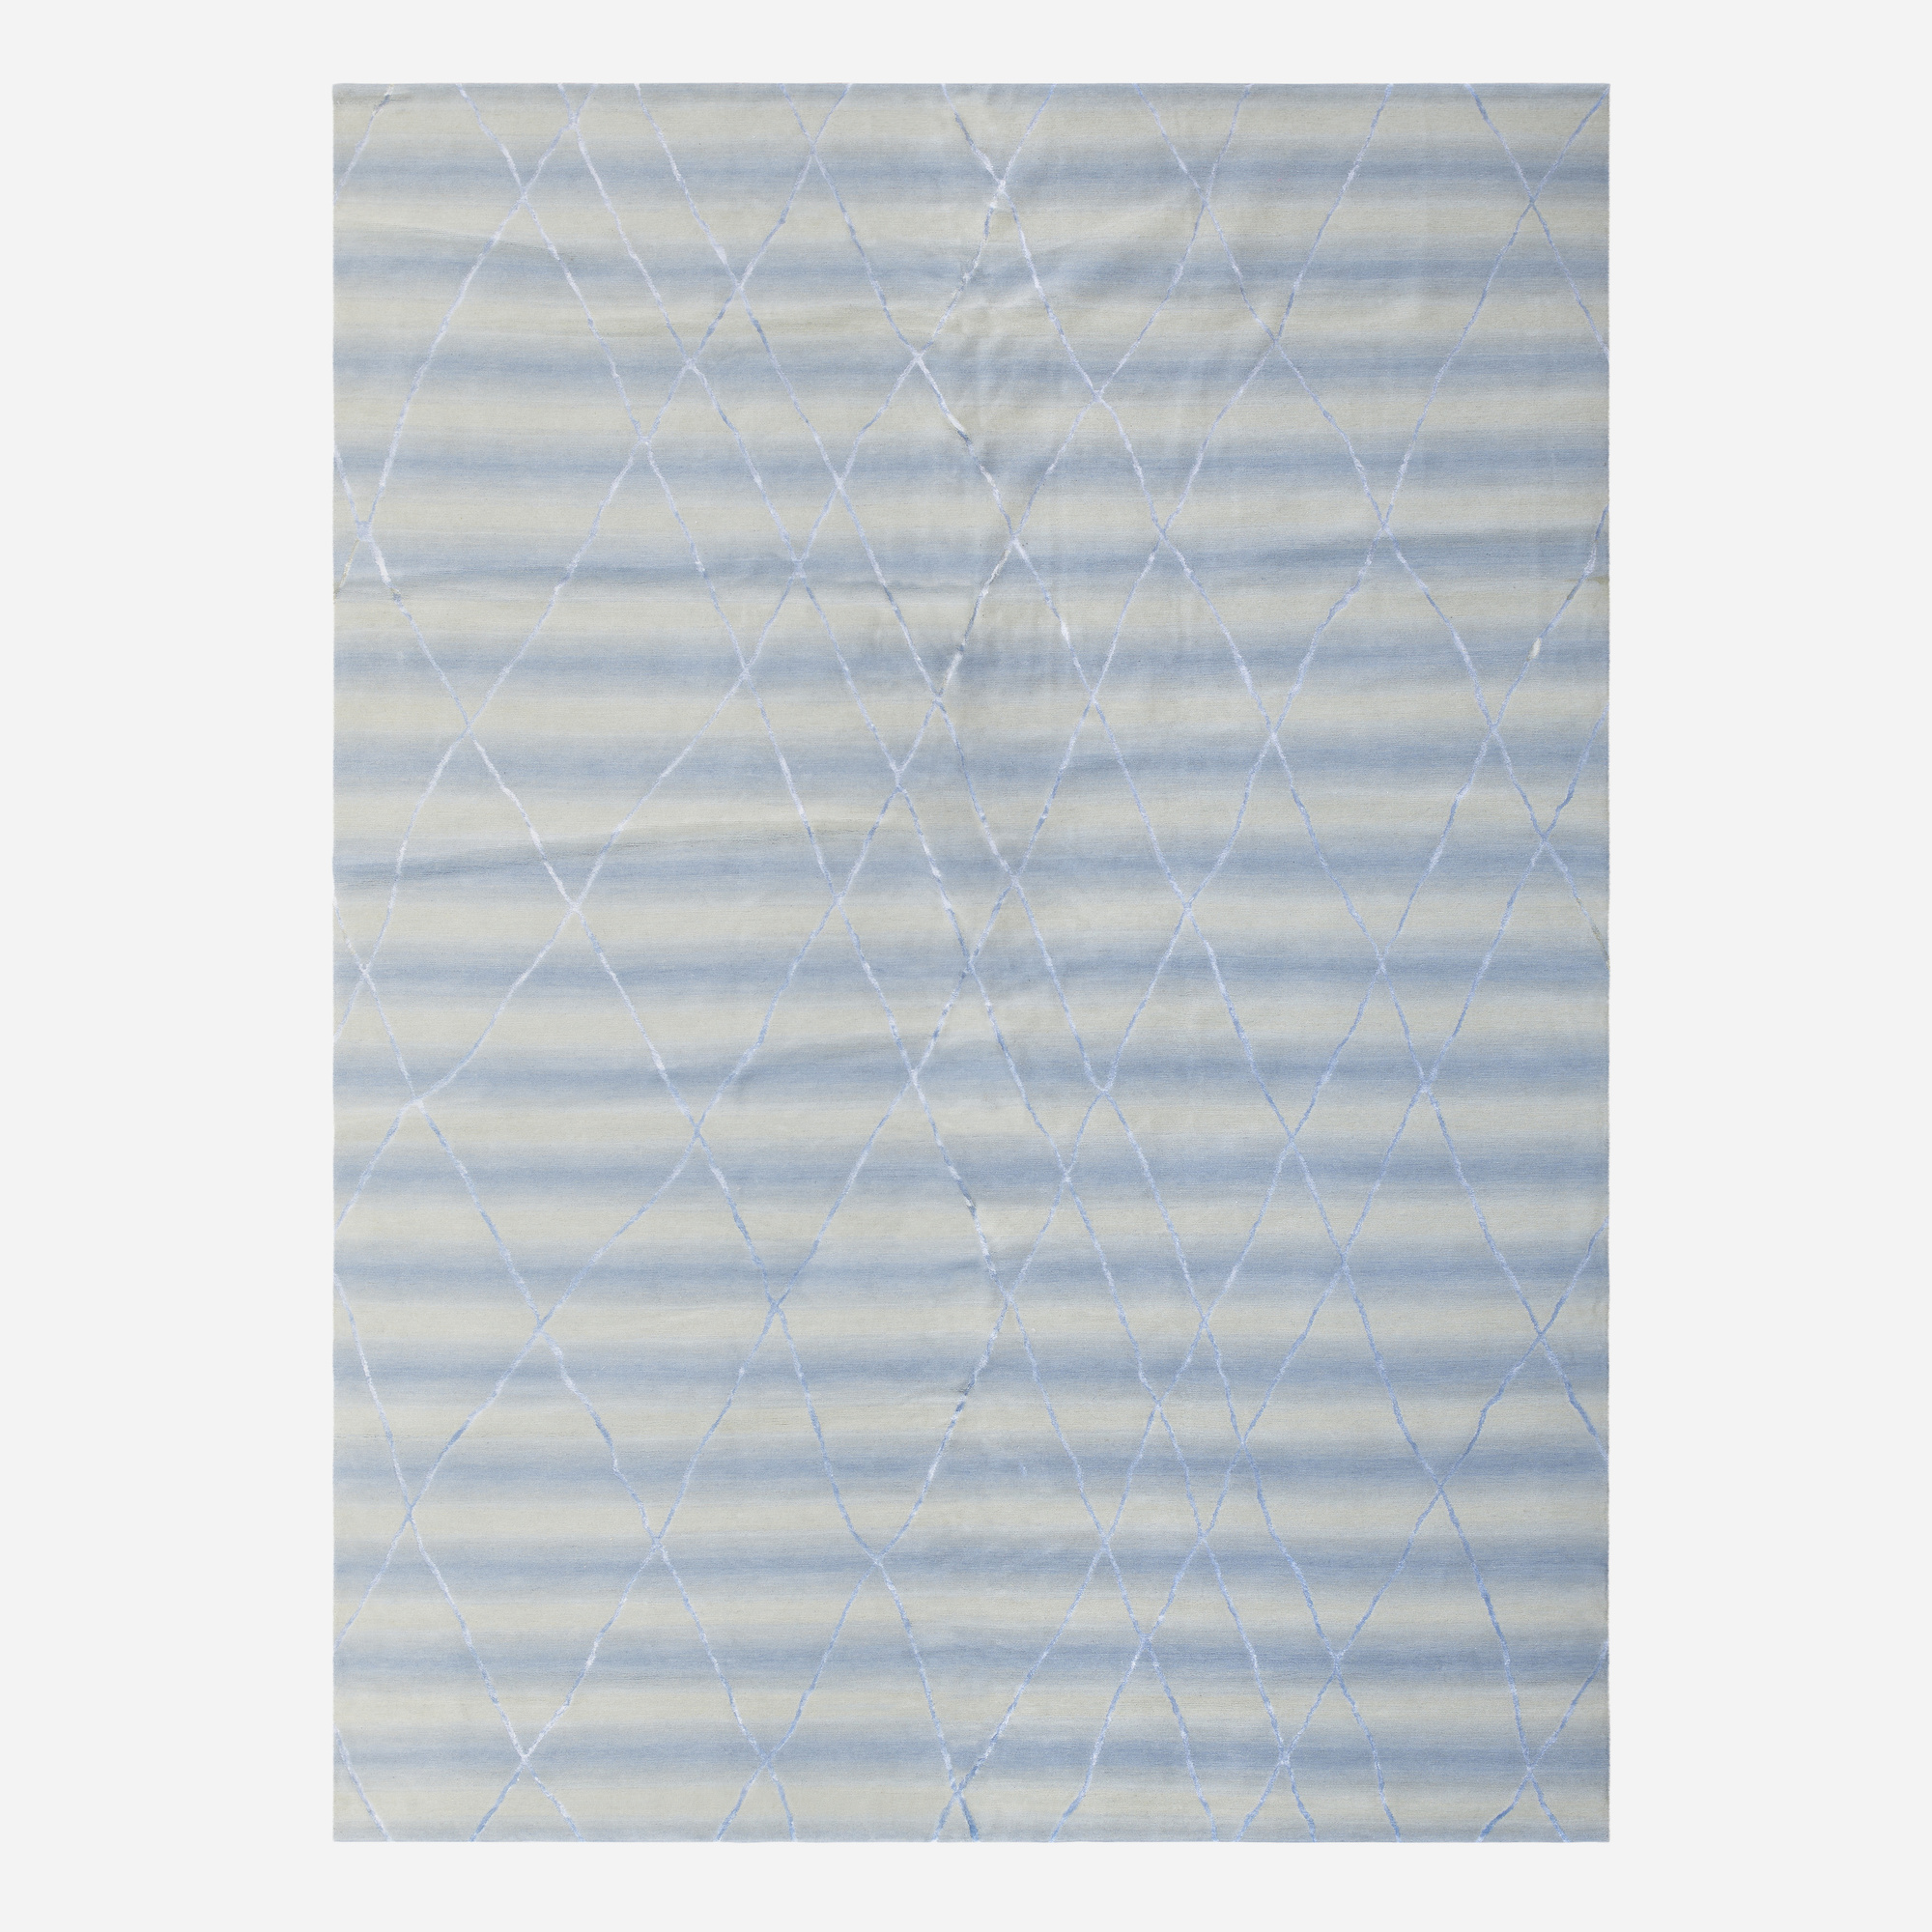 292: Contemporary / pile carpet (1 of 1)